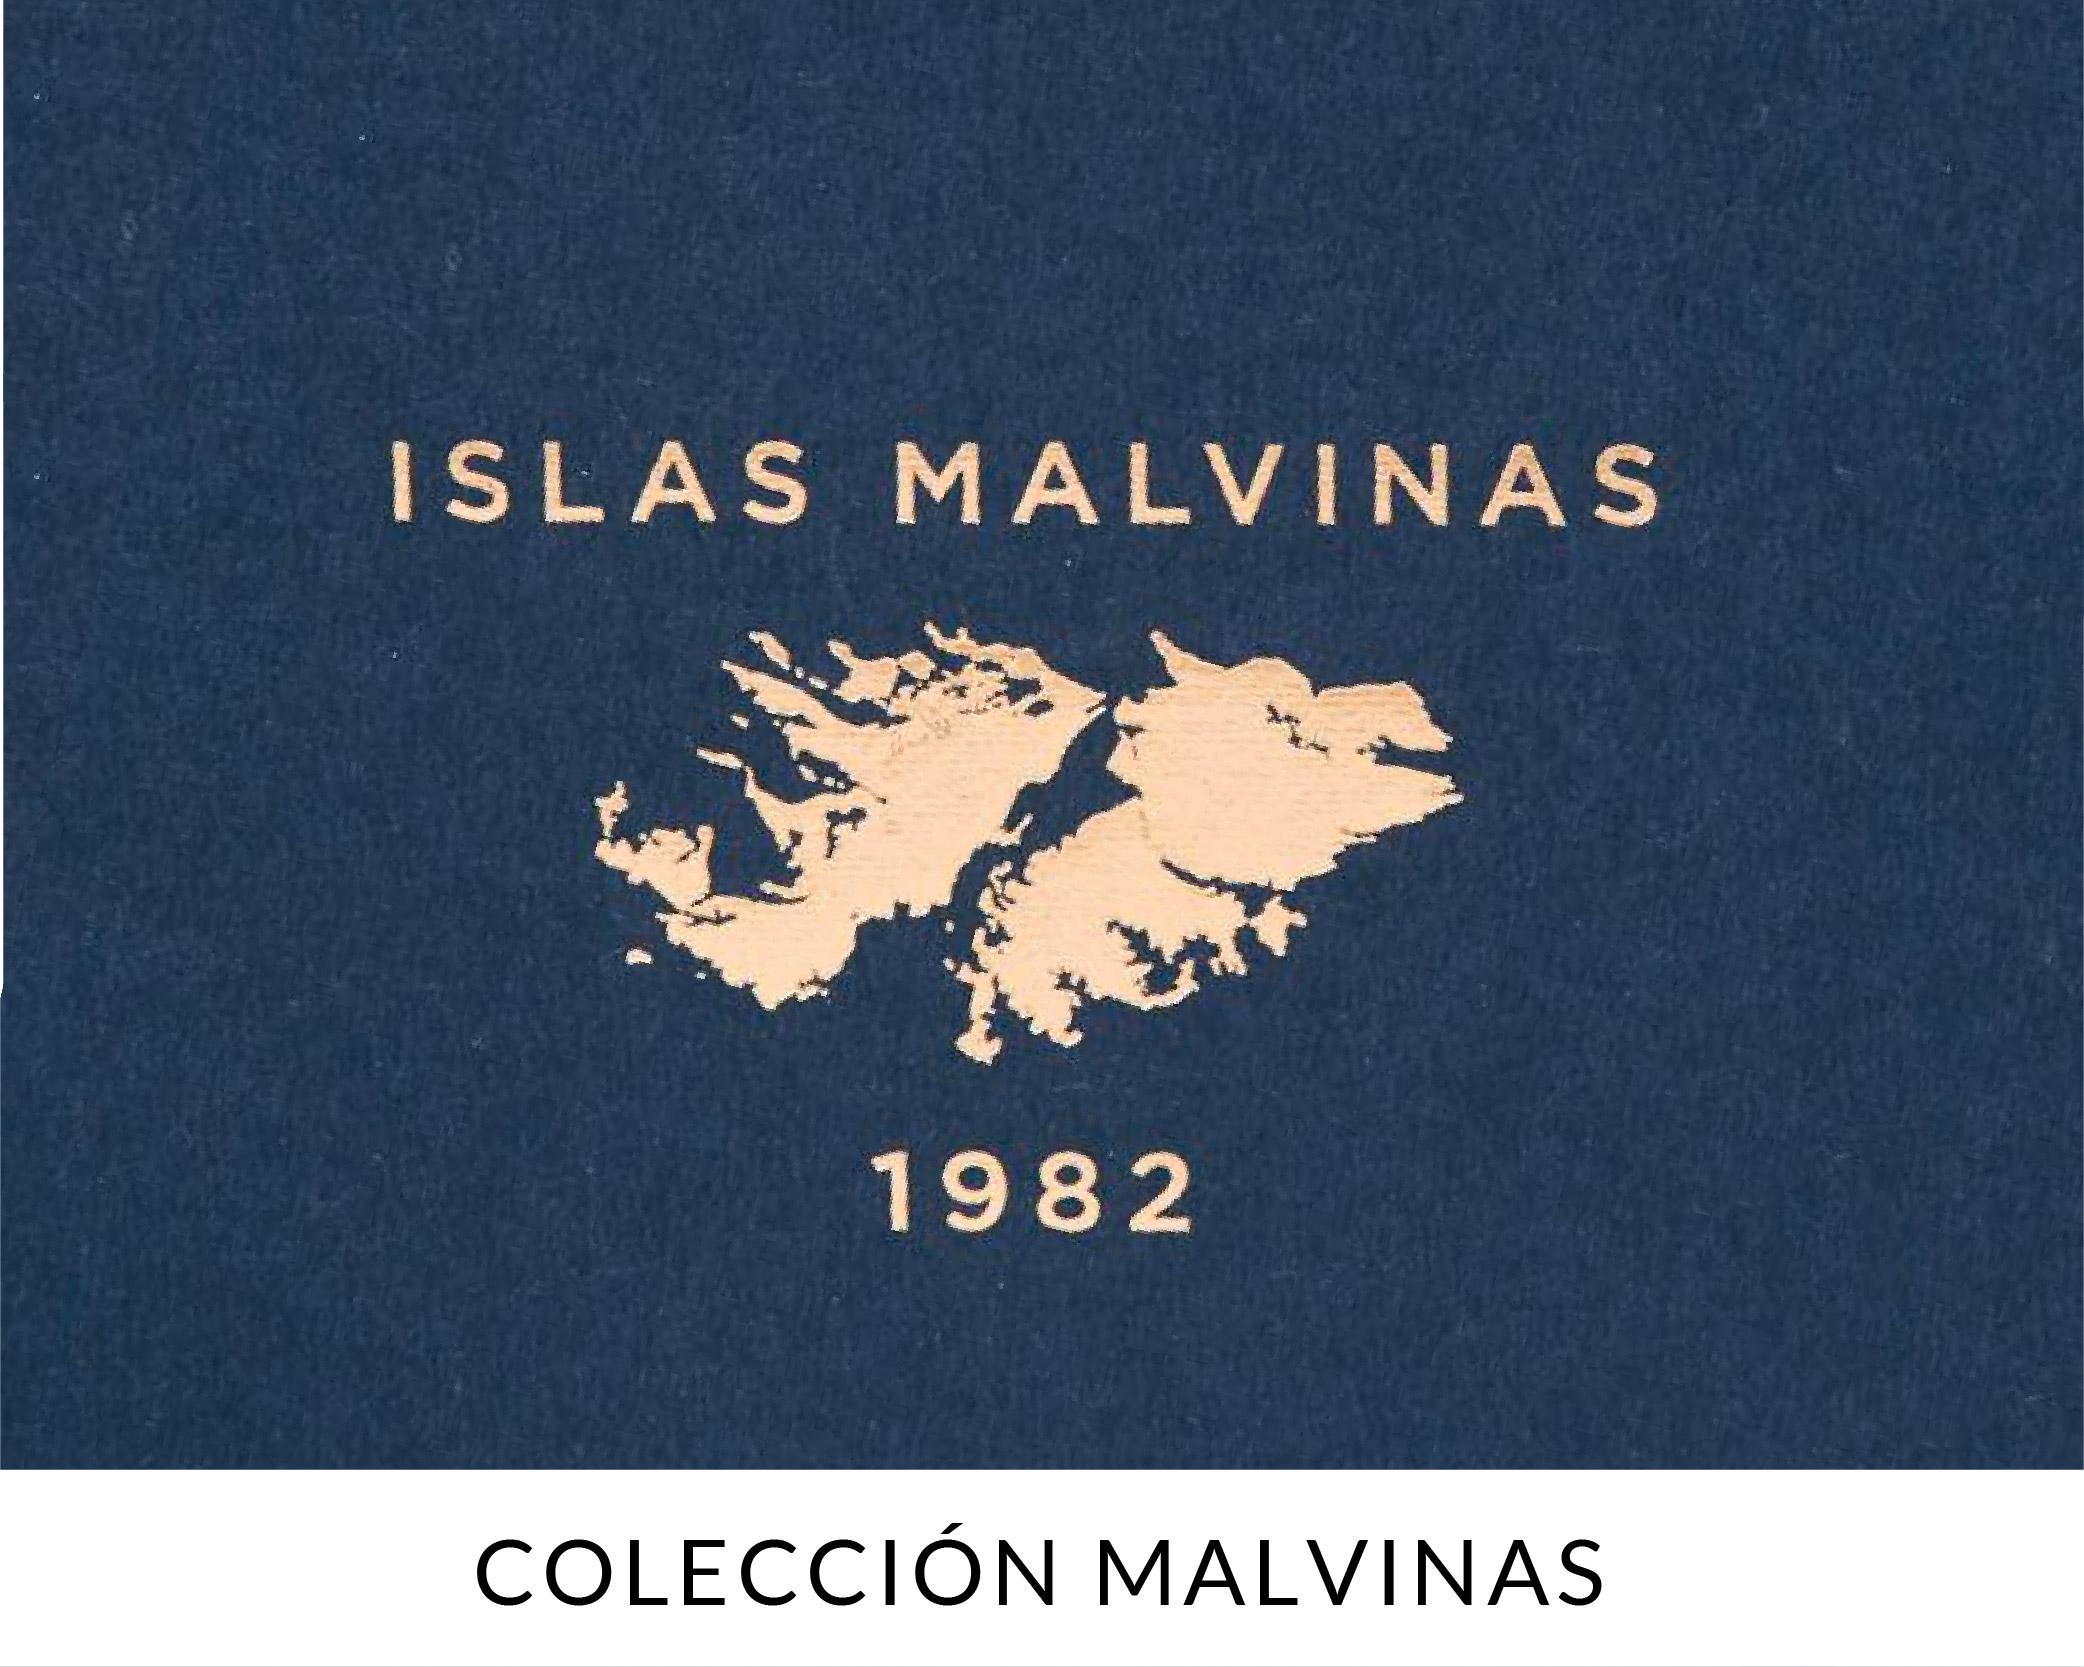 Coleccion Malvinas